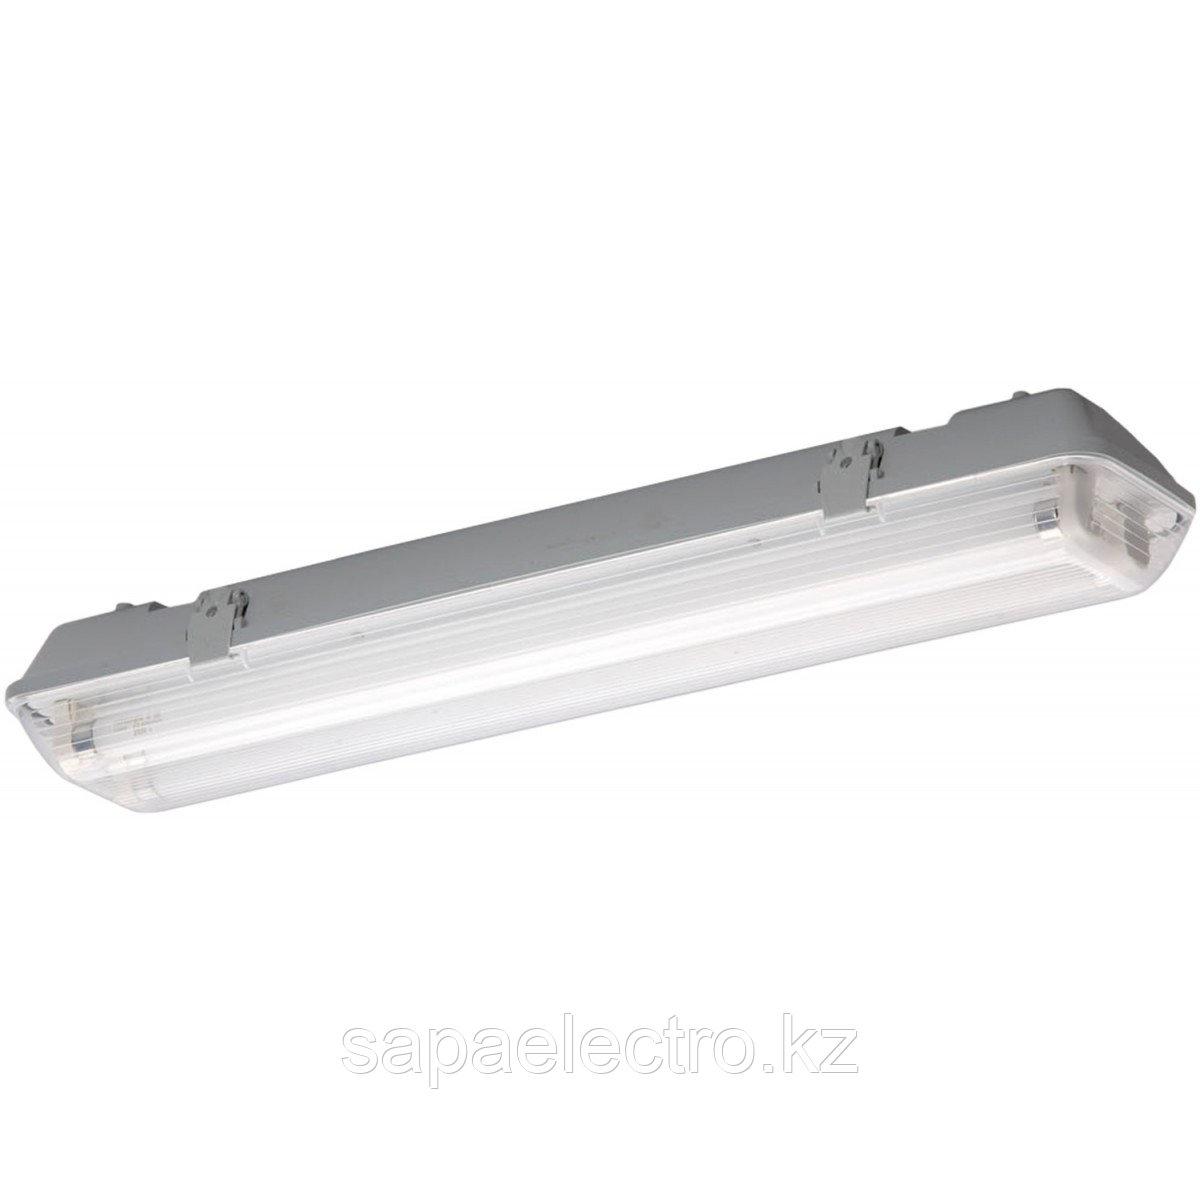 Св-к LEDTUBE LZG 2x9W +лампа (60м) MEGALUX